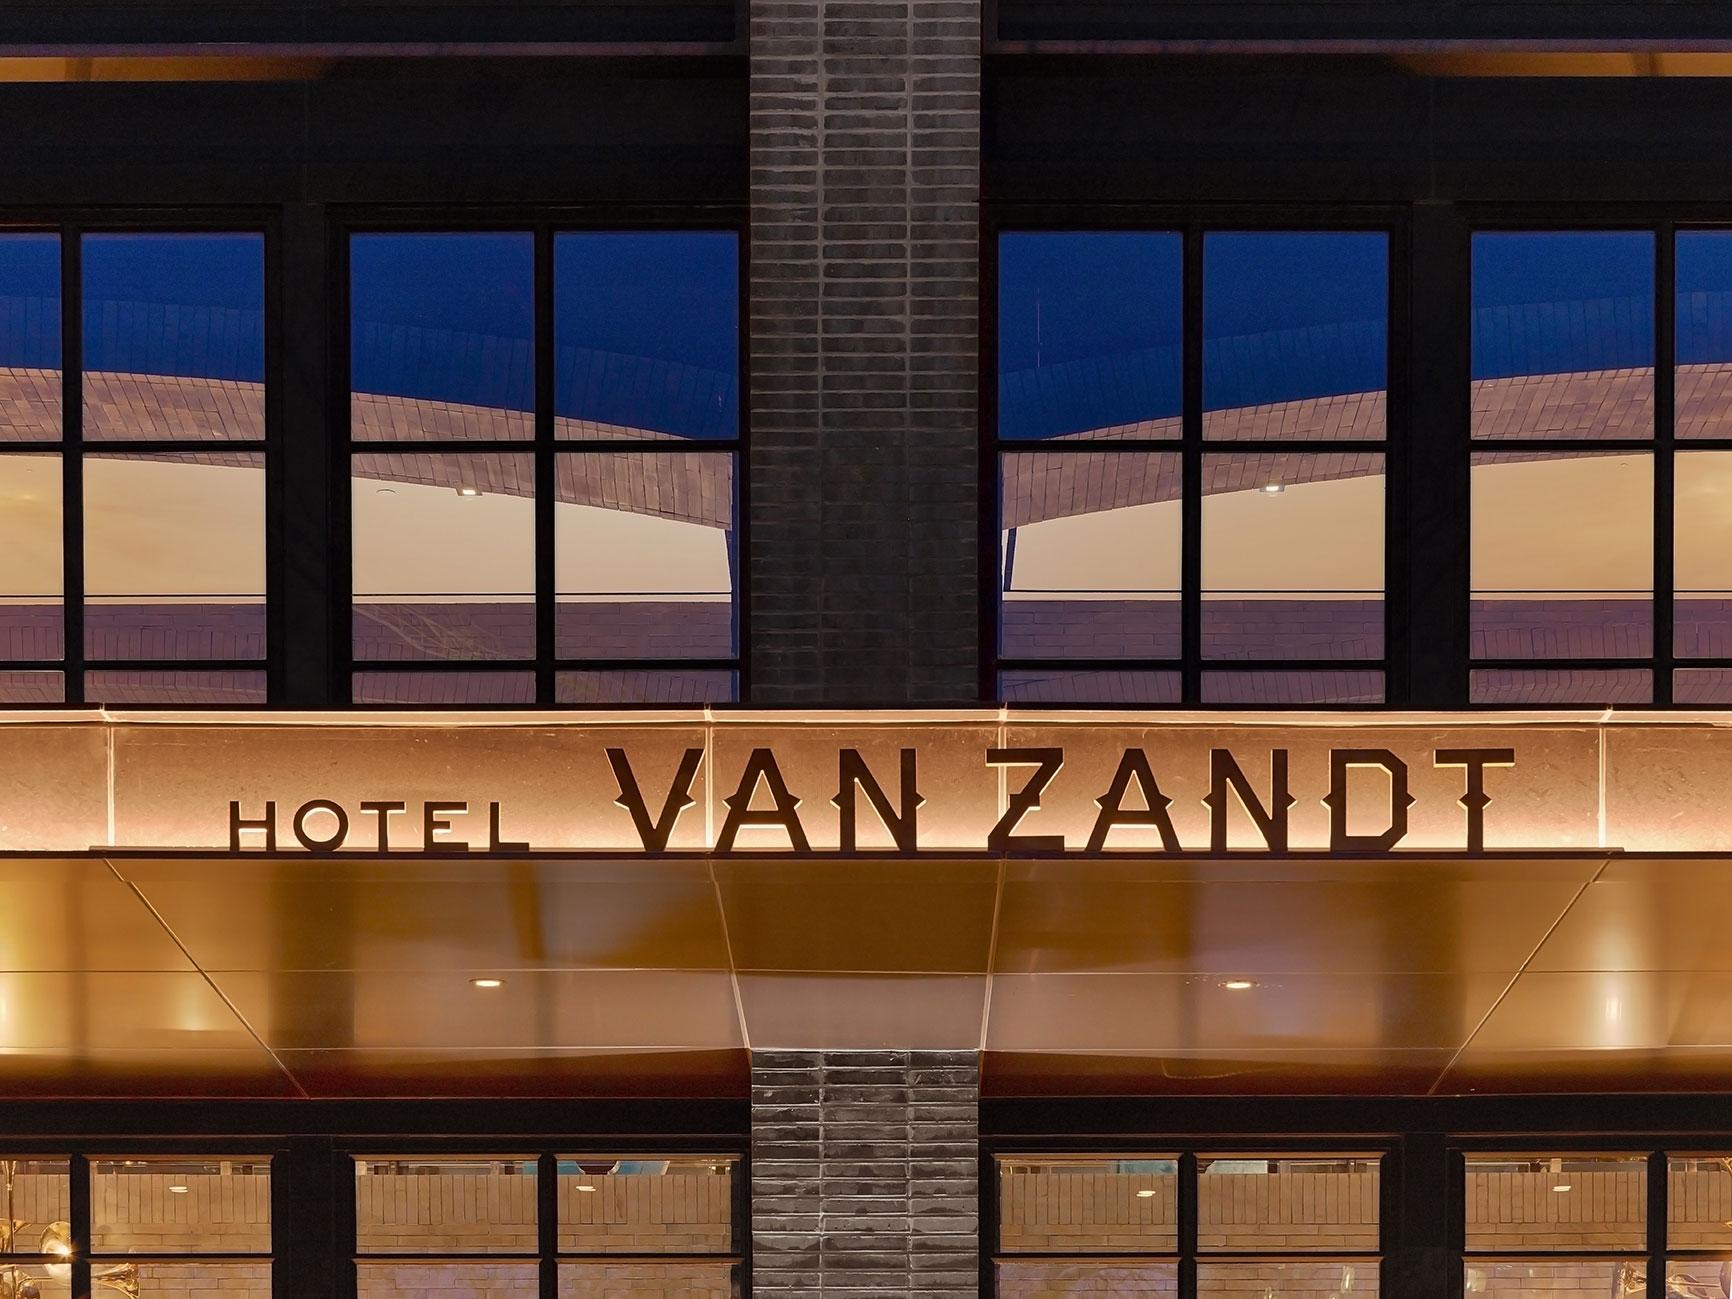 Van-Zandt-Hotel-Austin-2015-(2).jpg